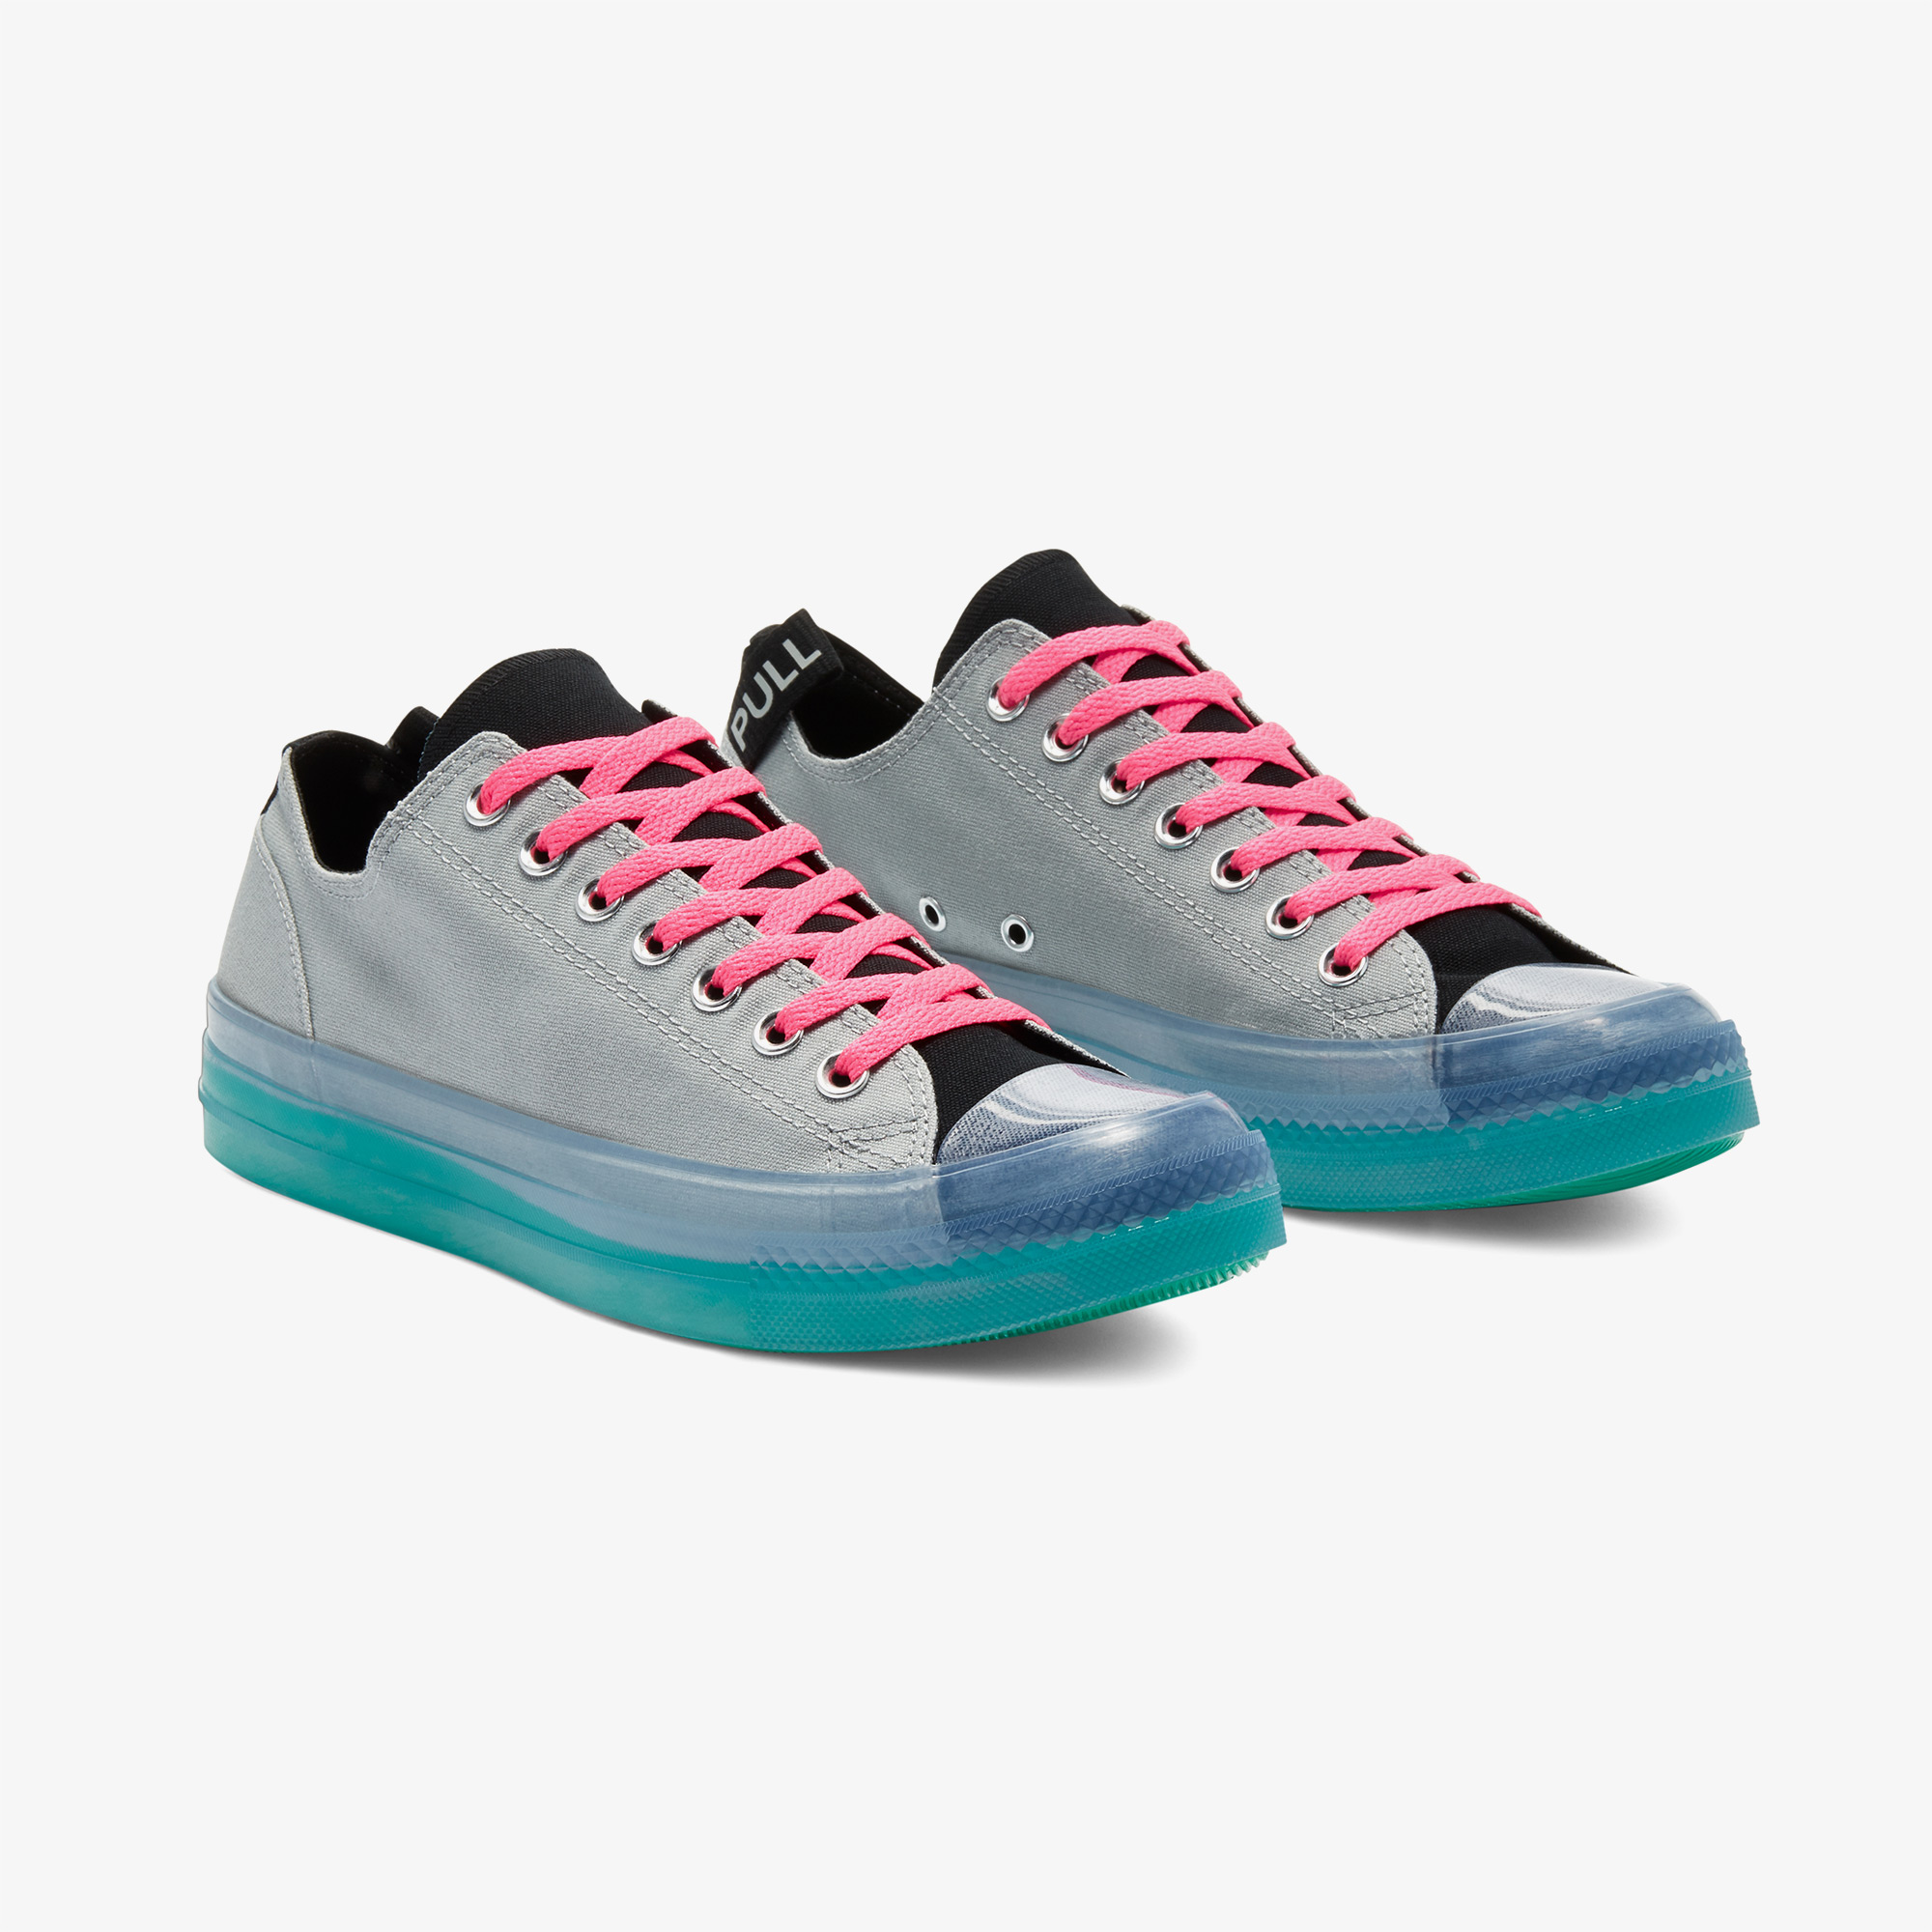 Converse Chuck Taylor All Star Digital Terrain Kadın Gri Sneaker